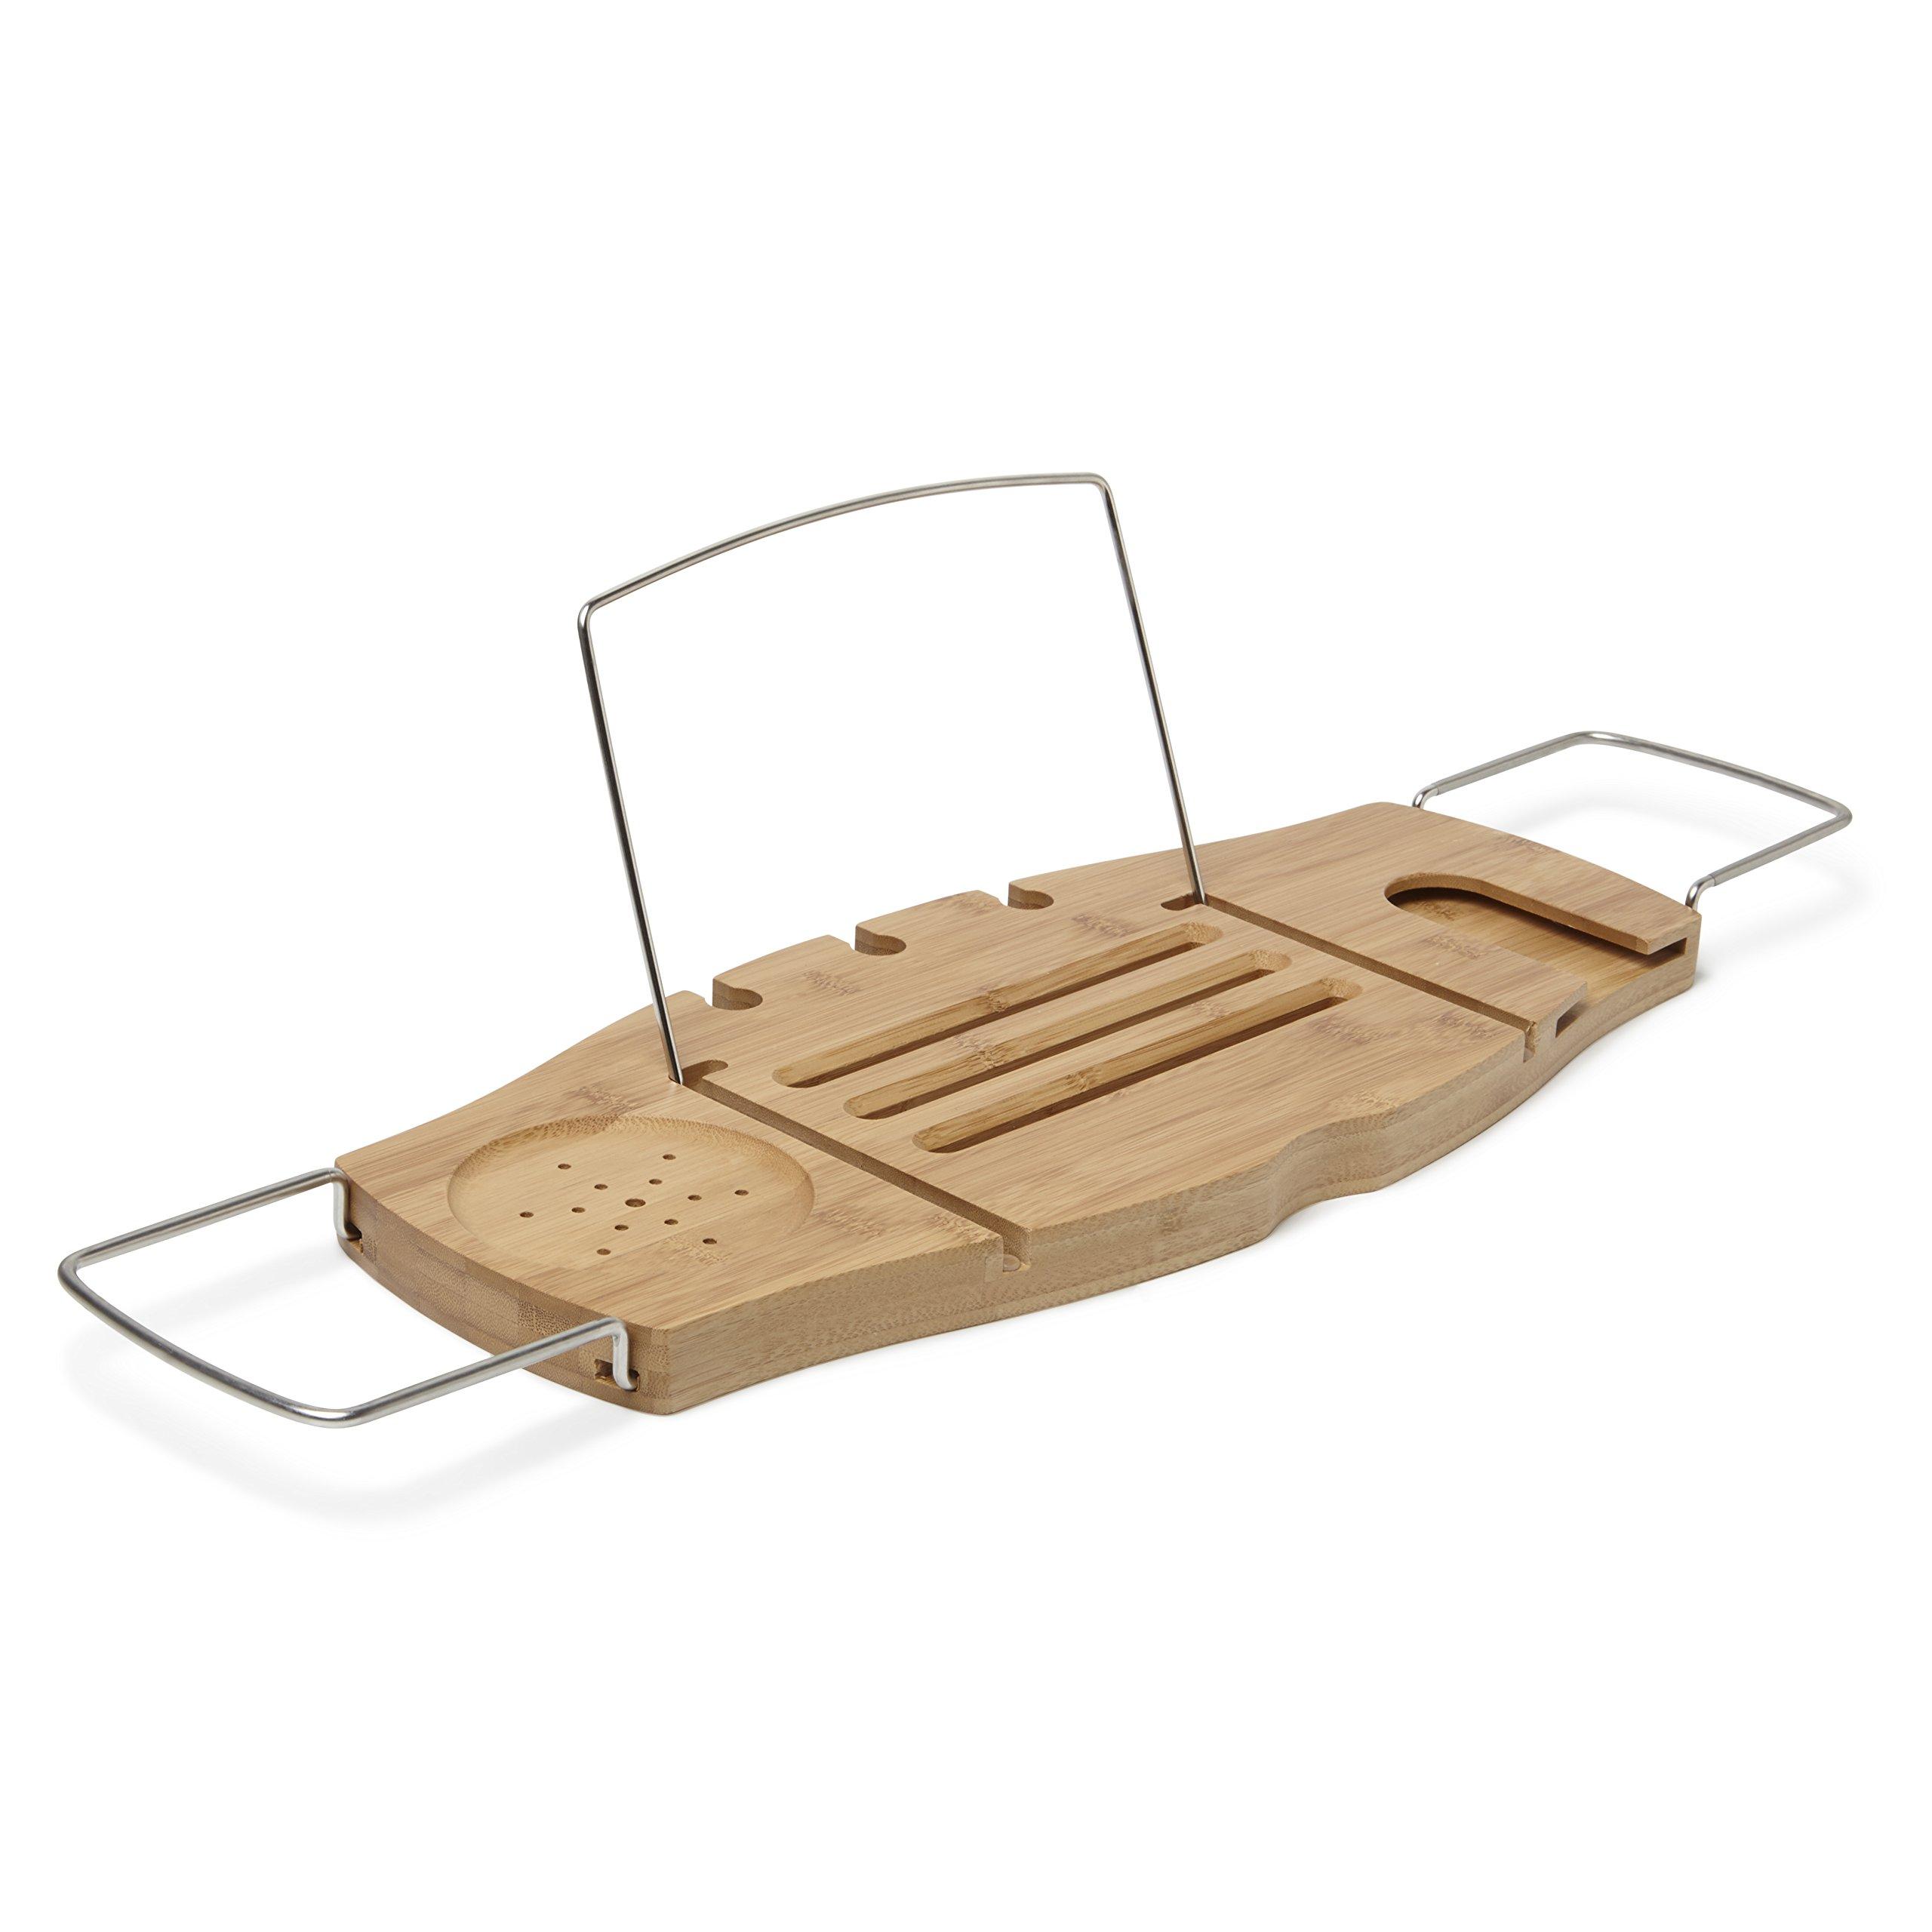 Umbra Aquala Bamboo and Chrome Bathtub Caddy